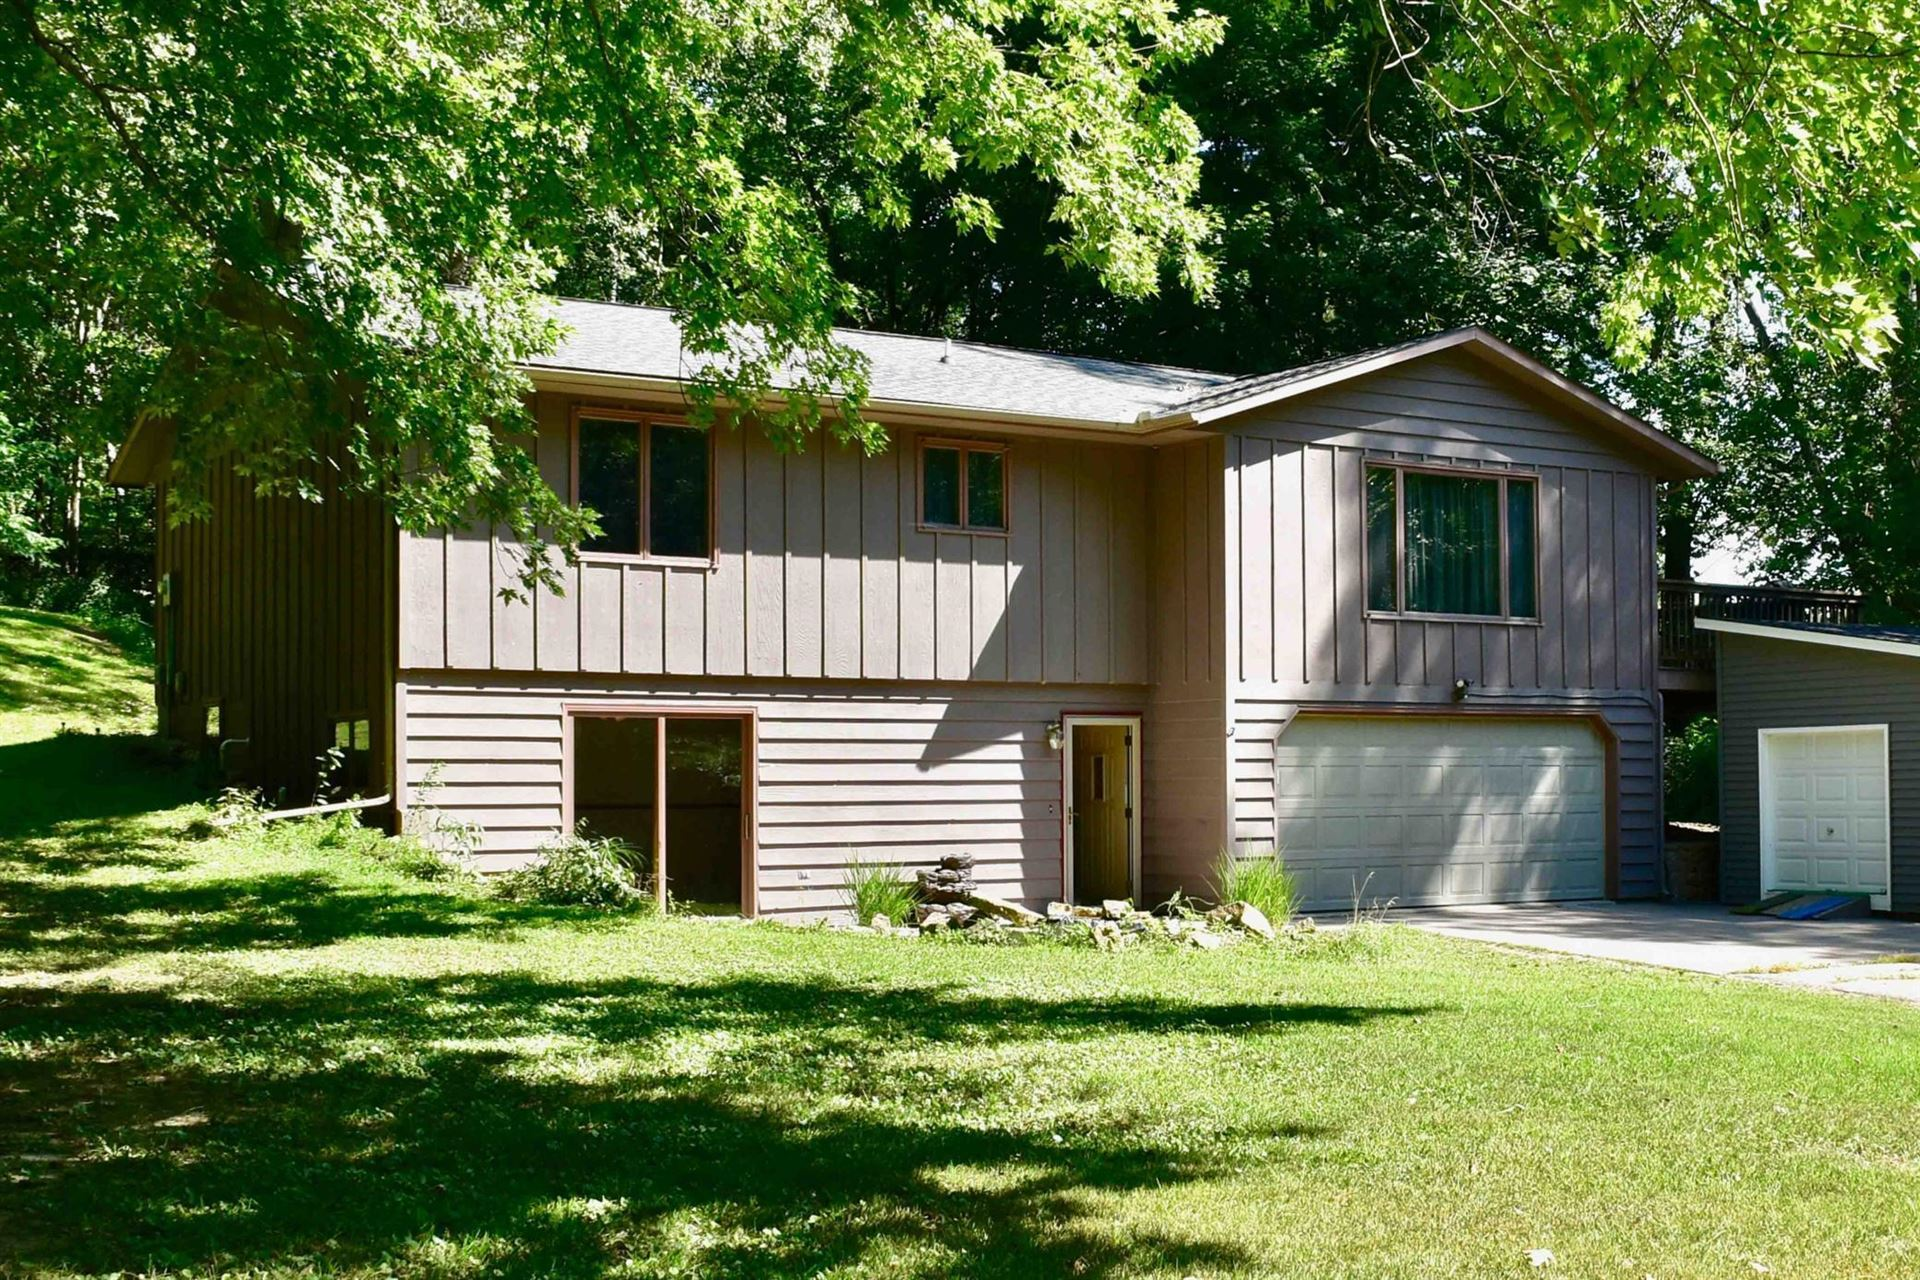 1375 Grandview Court, Goodview, MN 55959 - MLS#: 5645187